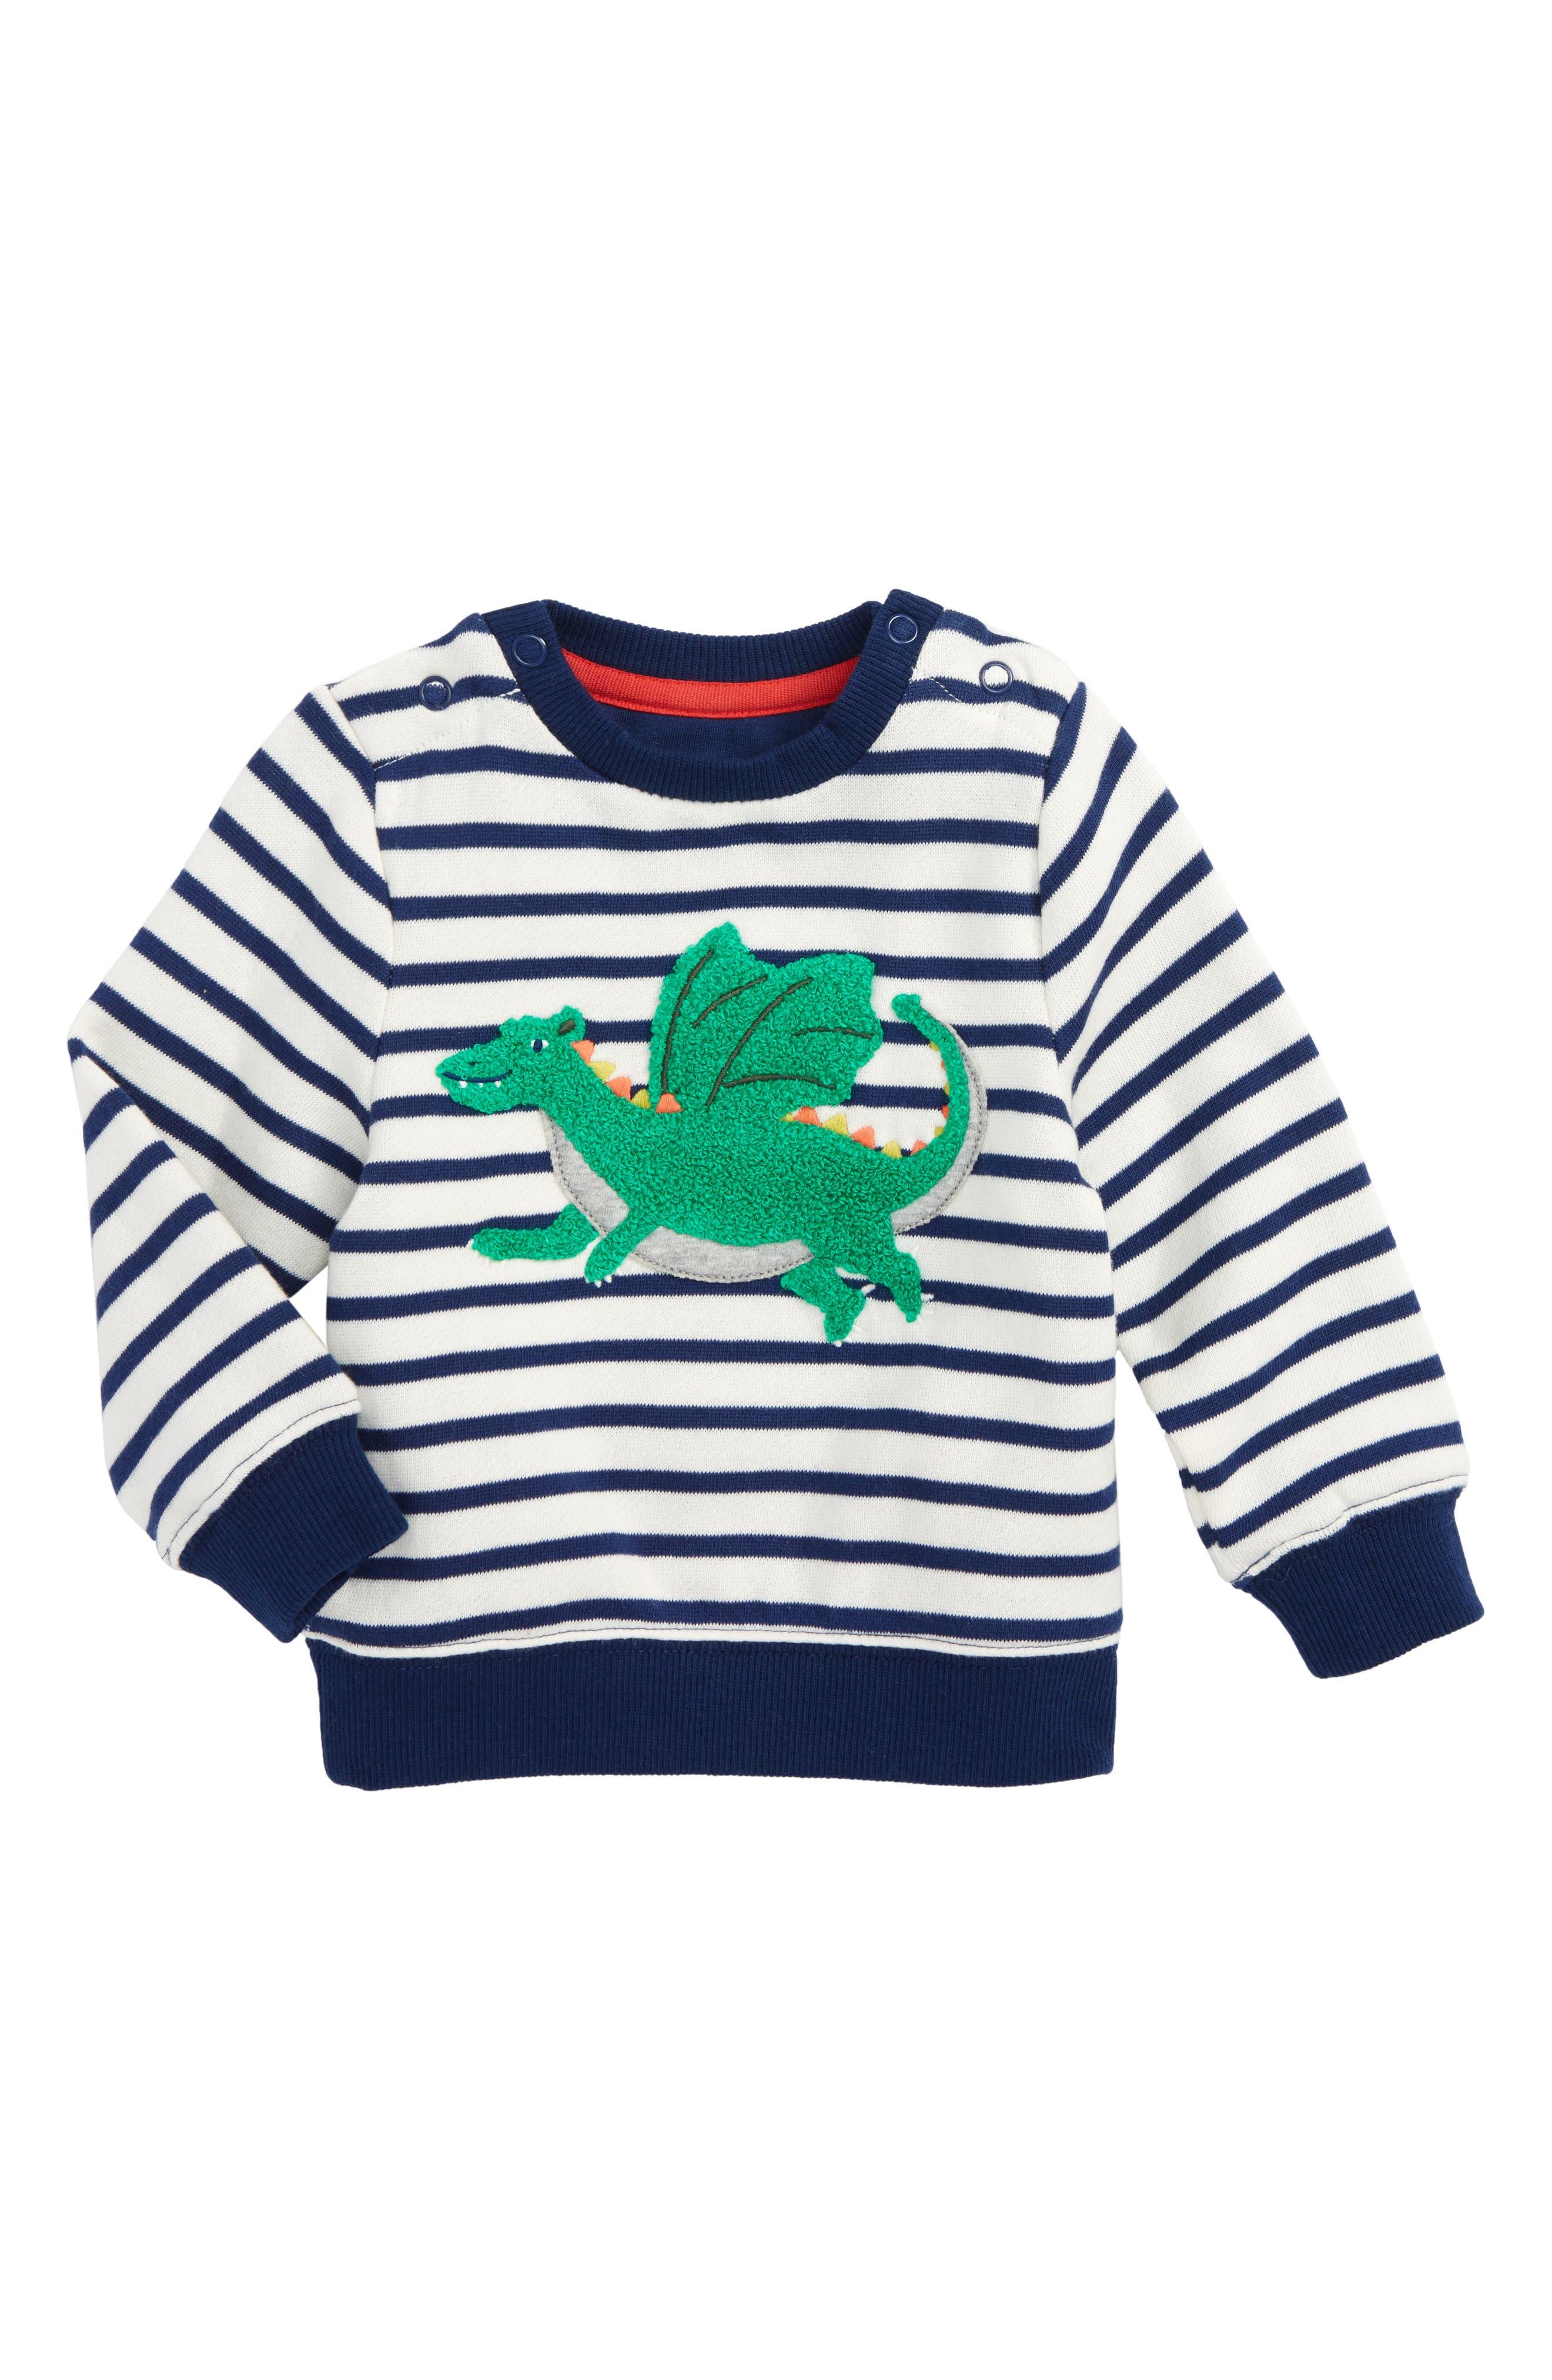 Appliqué Cozy Sweatshirt,                             Main thumbnail 1, color,                             900